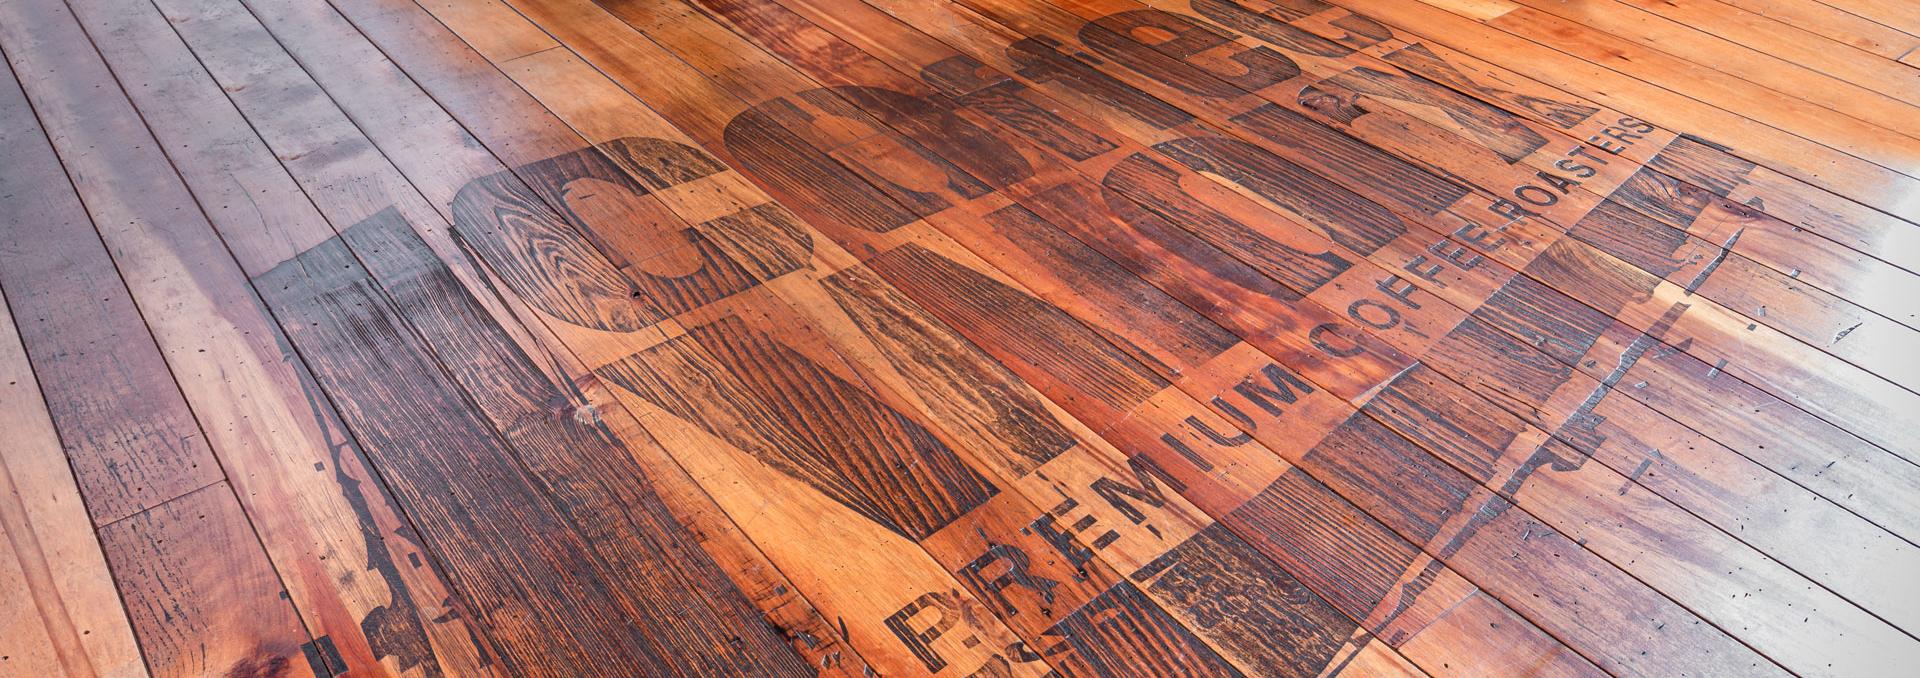 Artworks-wood